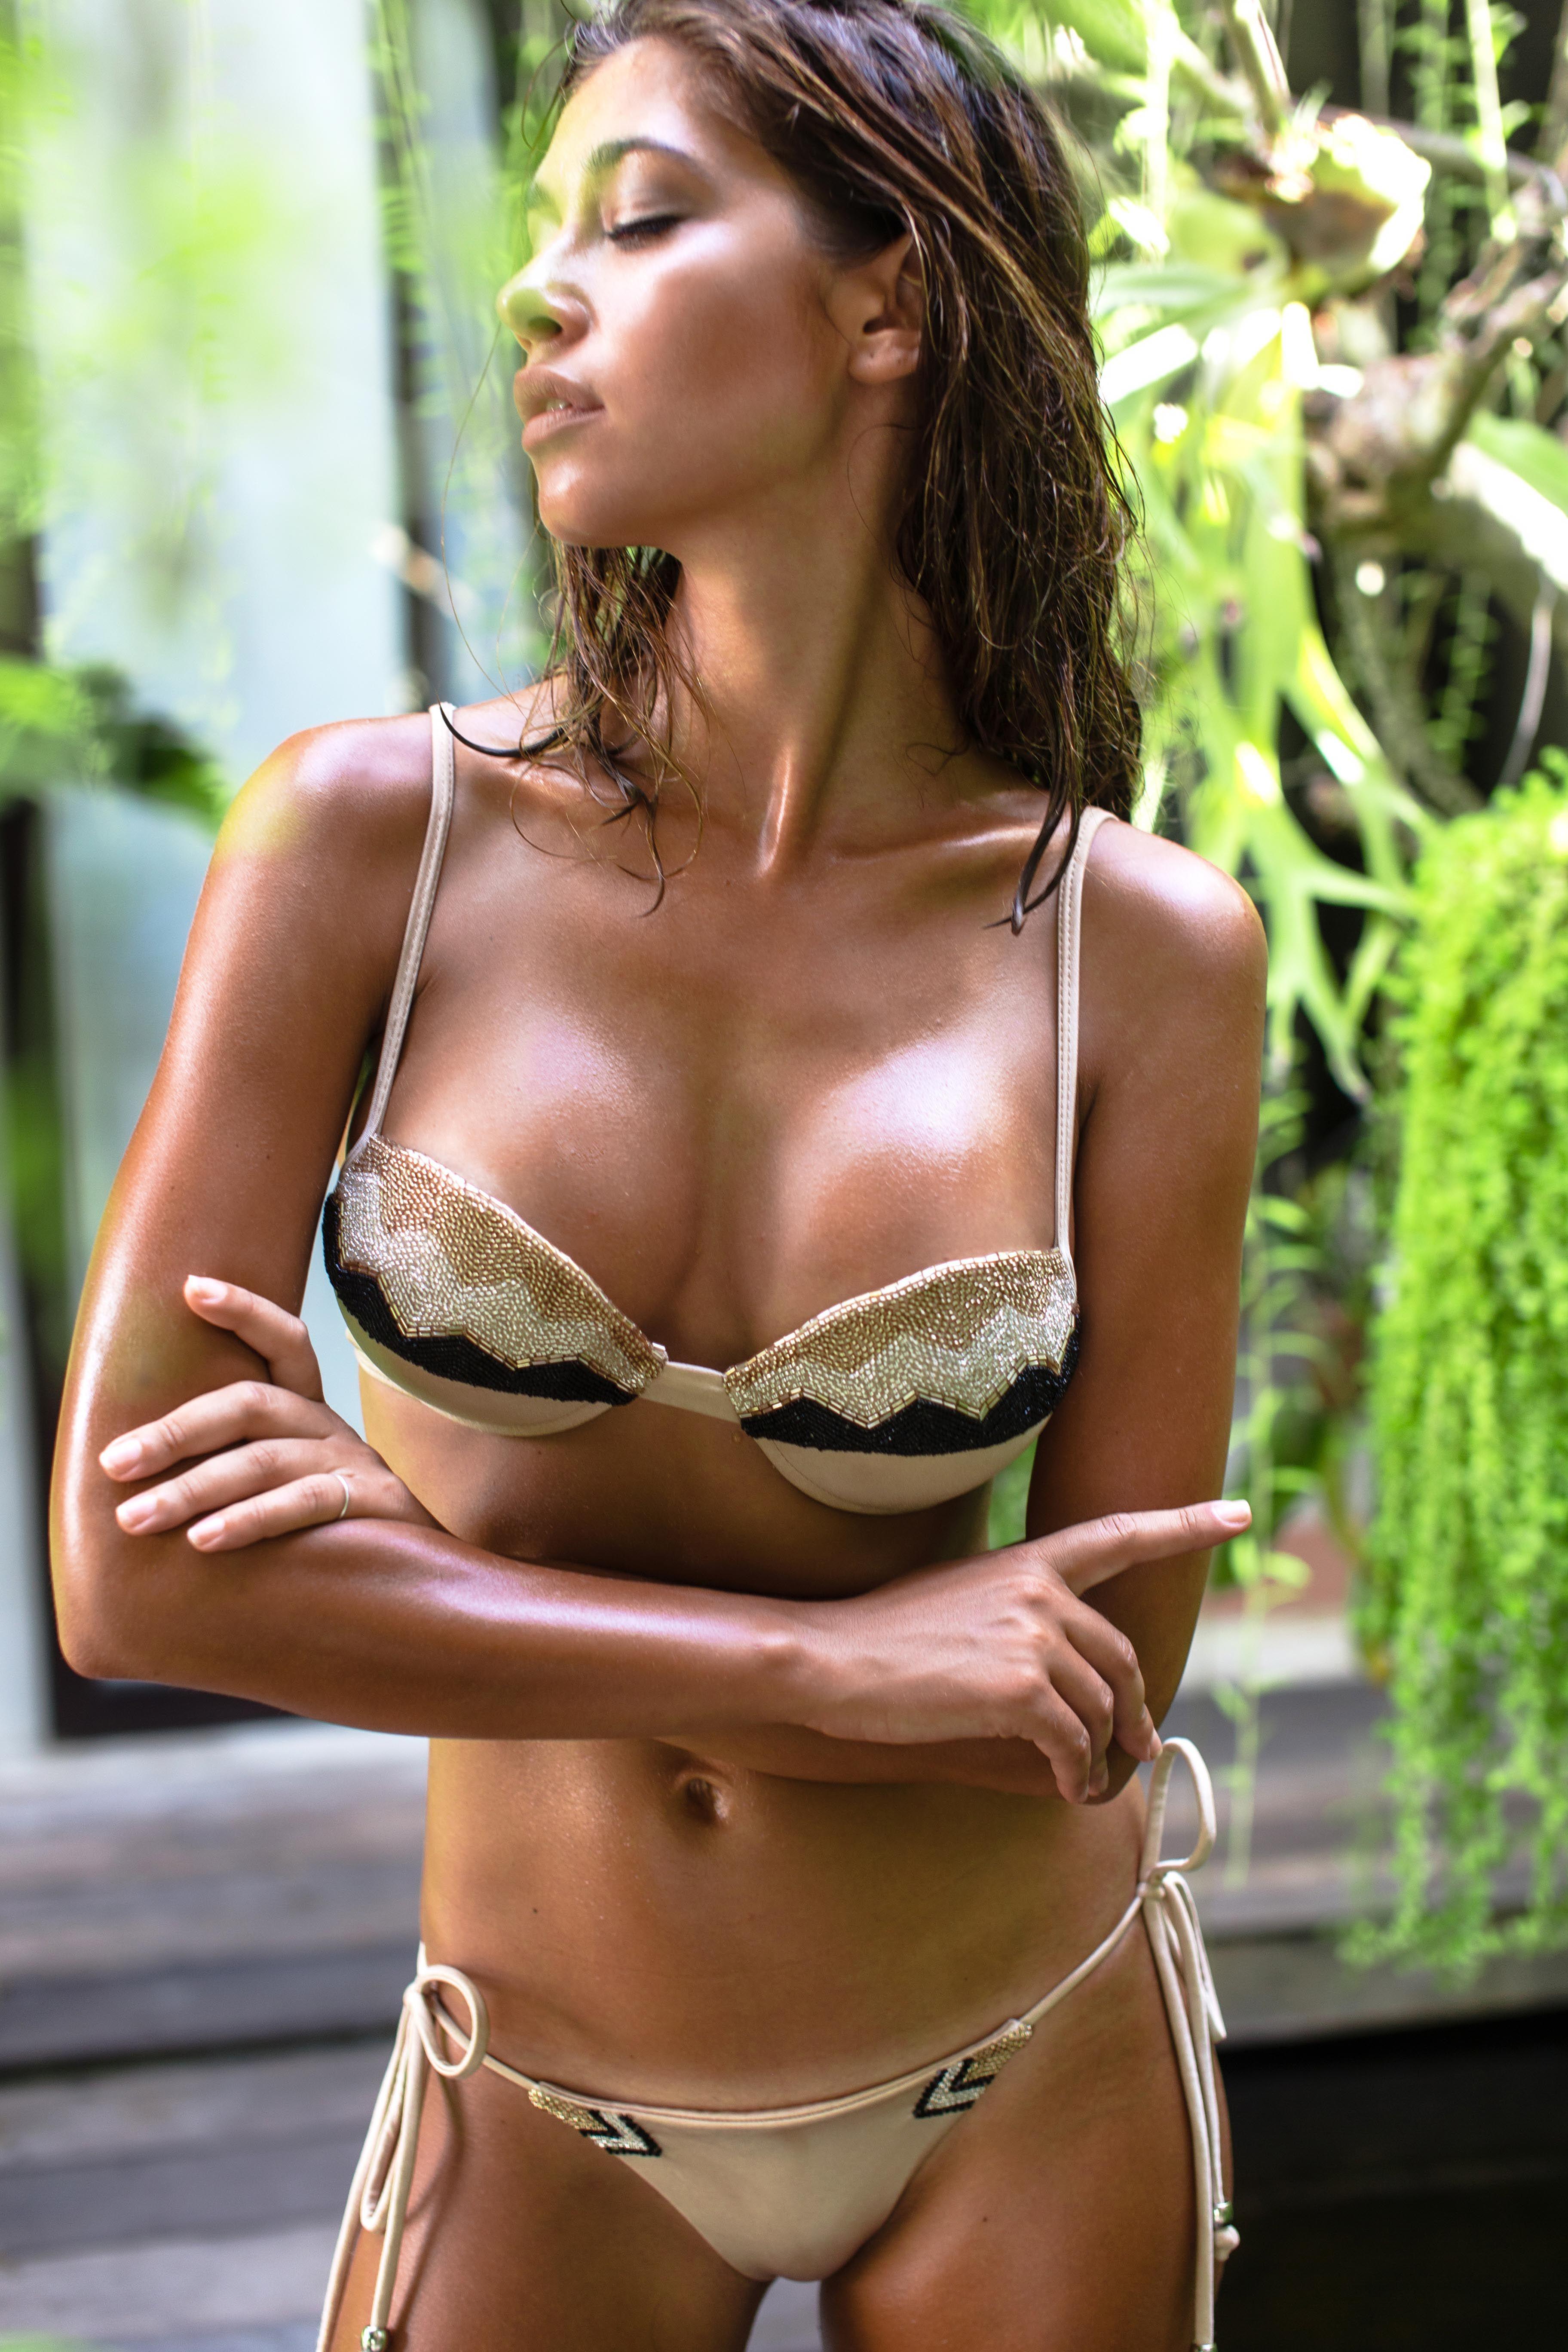 Sexy Aviva Farber Nude Pics Pics